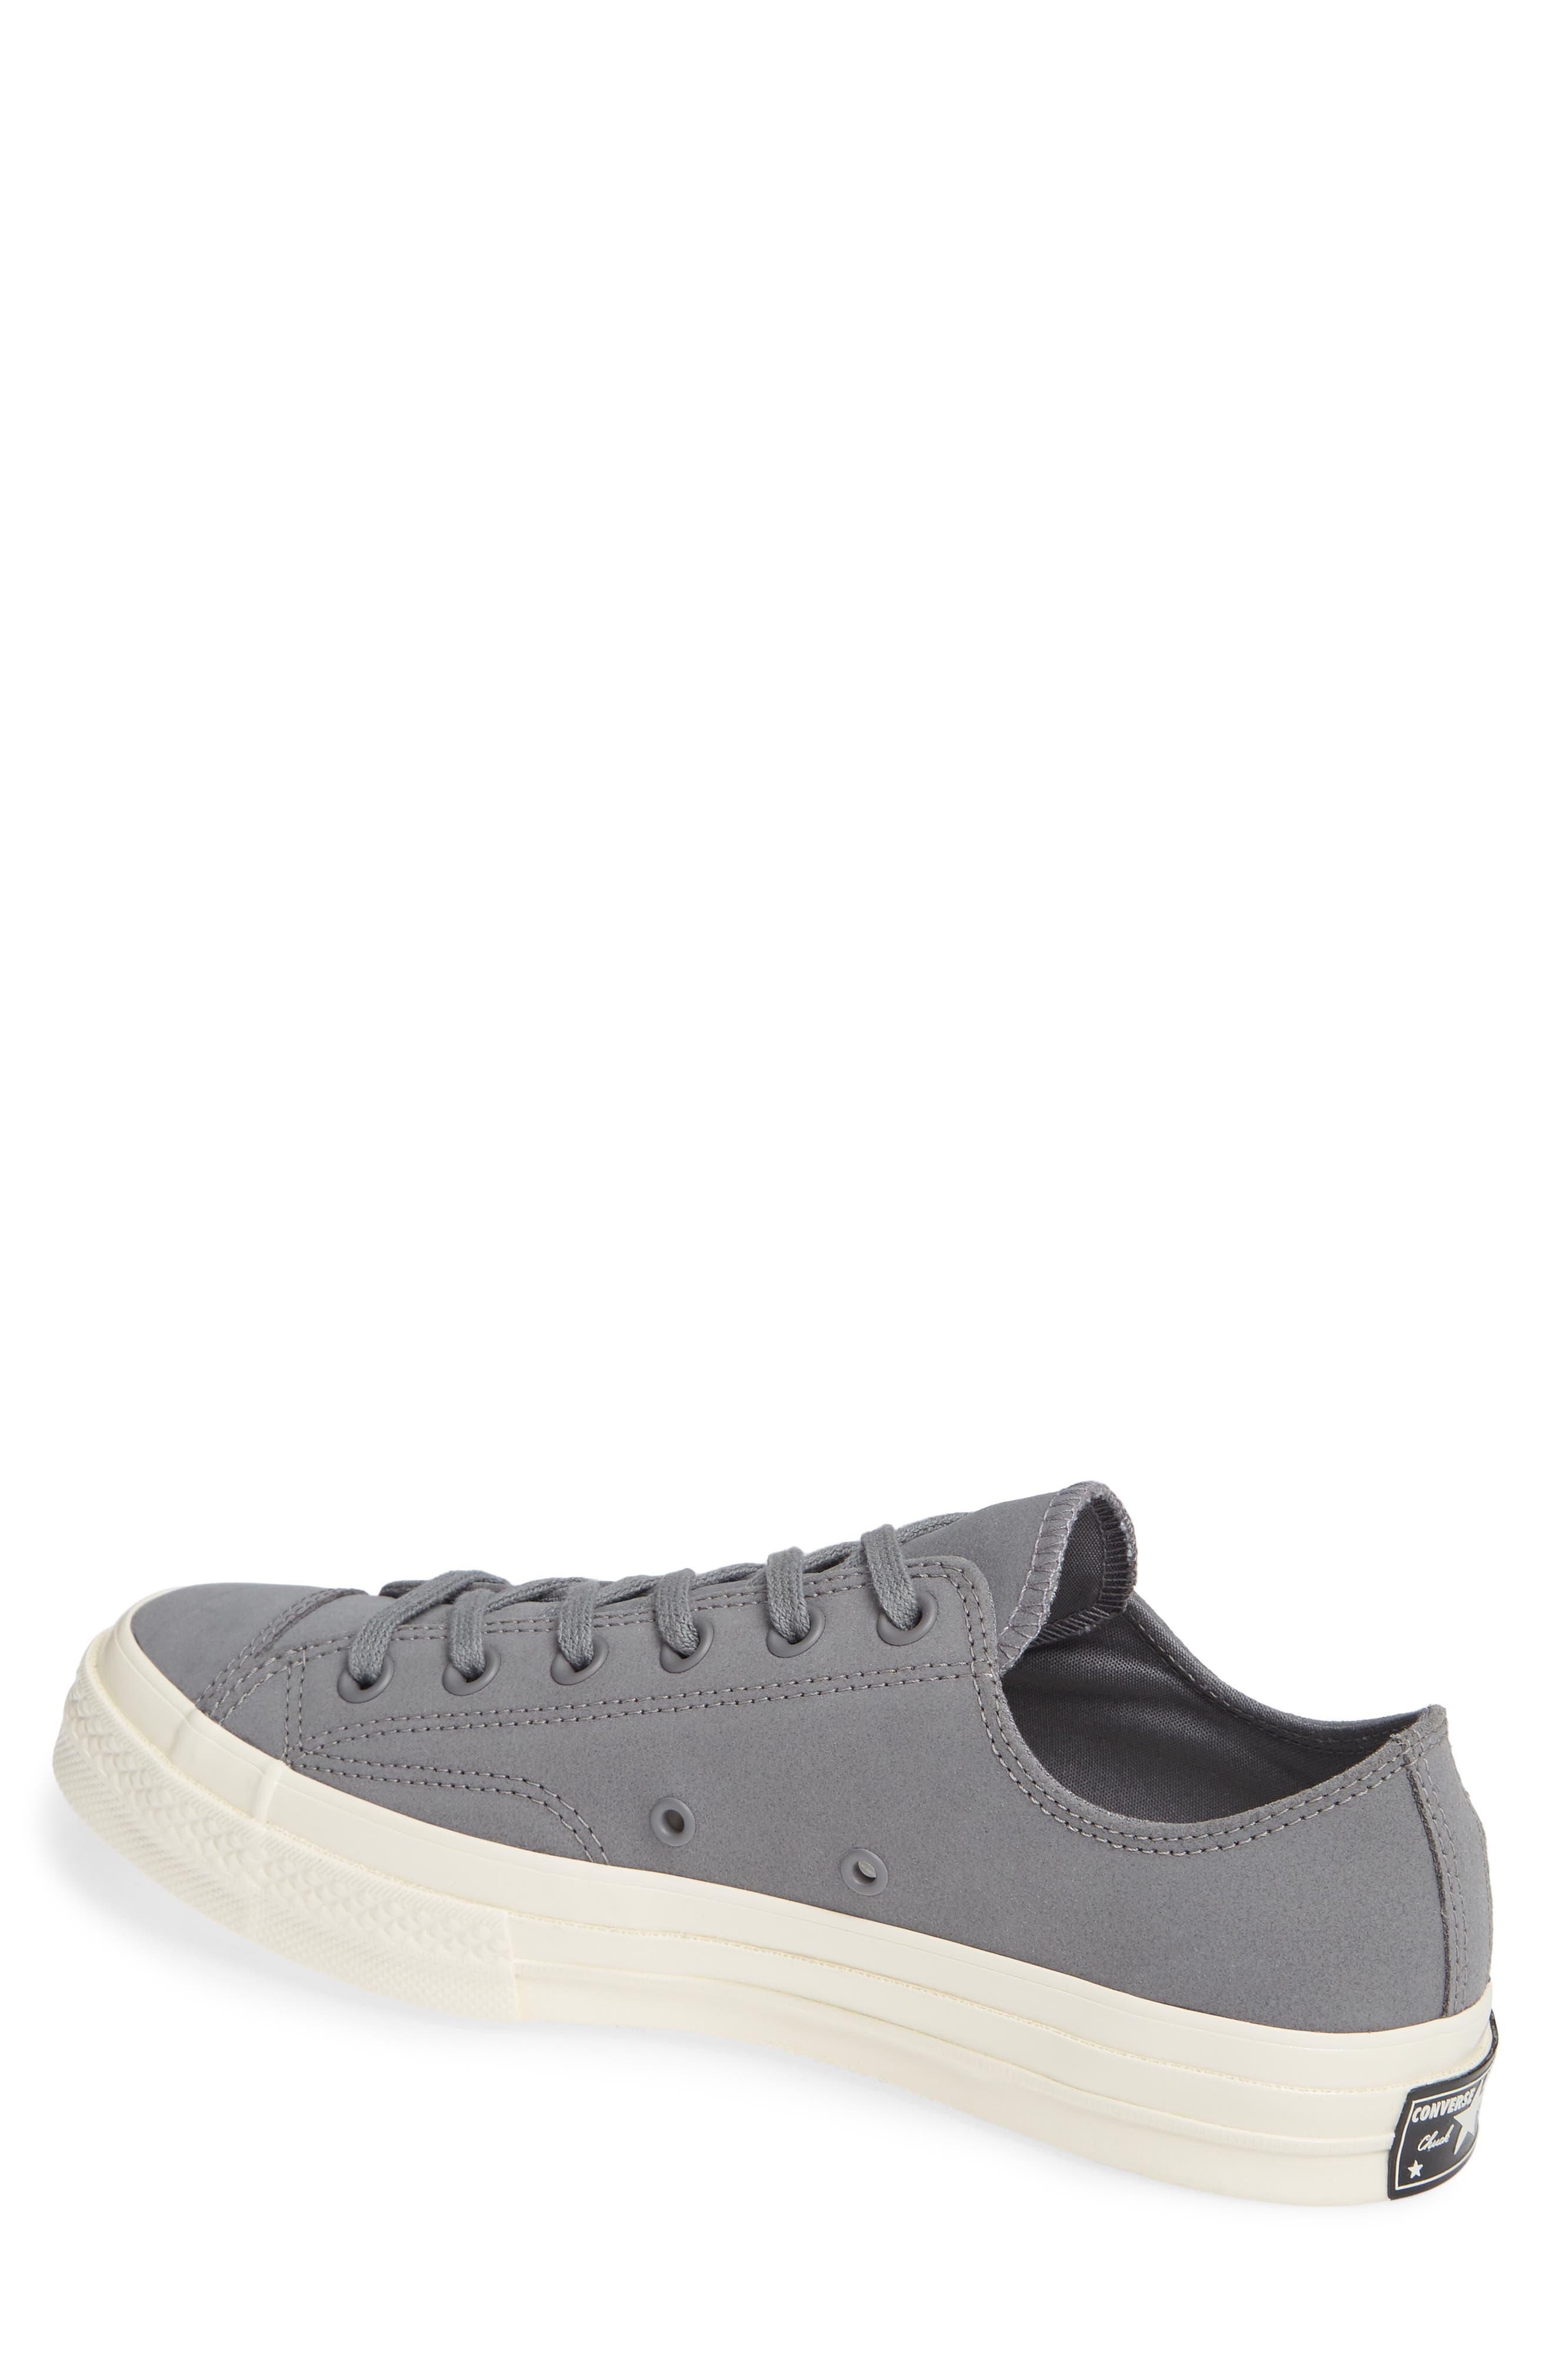 CT 70 Sneaker,                             Alternate thumbnail 2, color,                             GREY